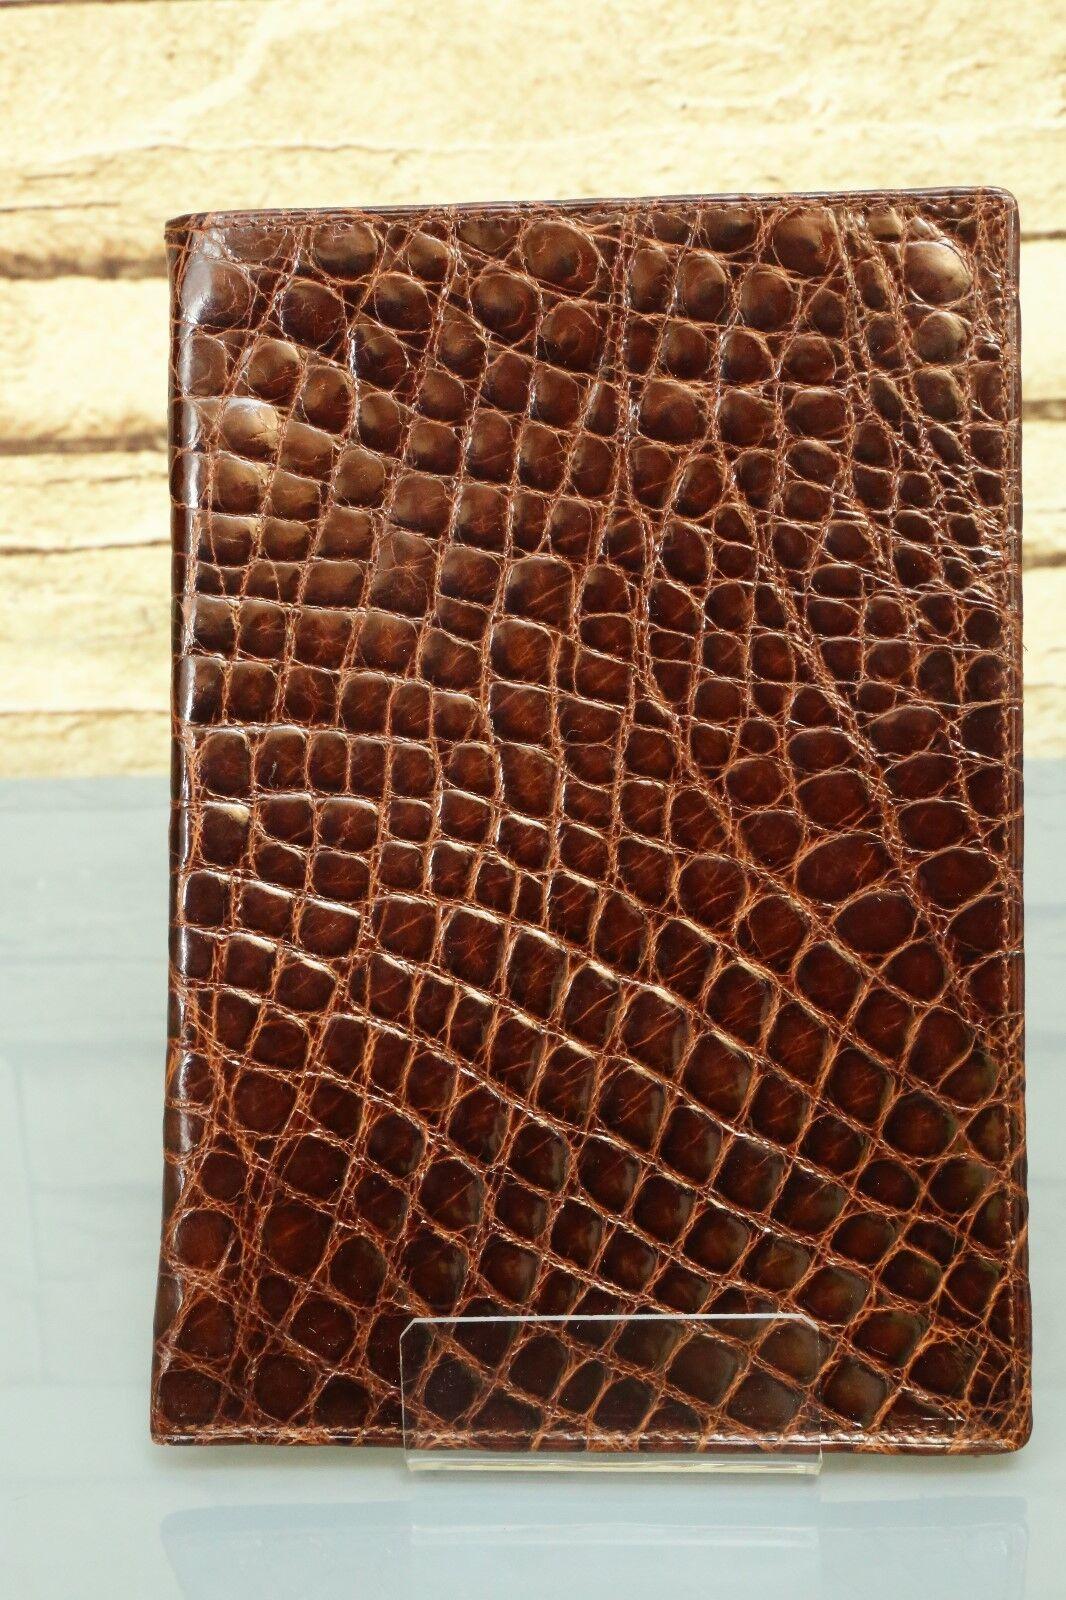 AUSWEIS-ETUI AUSWEIS-ETUI AUSWEIS-ETUI KRALLE - Echtes Kroko Leder  (IRV) NEU Wallet crocodile NEW 912    | Angemessener Preis  6241e0